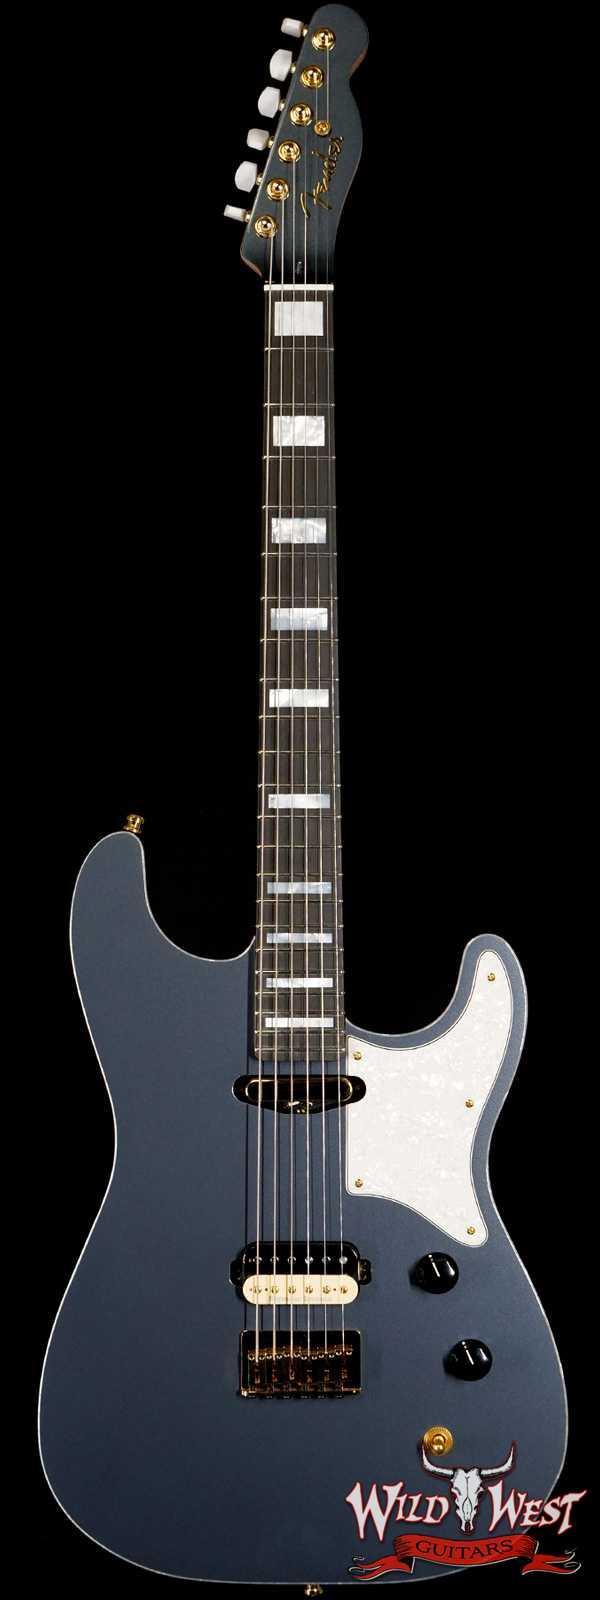 2020 NAMM Fender Custom Shop Kyle McMillin Masterbuilt Hybrid Stratocaster NOS SH Ebony Fingerboard Charcoal Frost Metallic